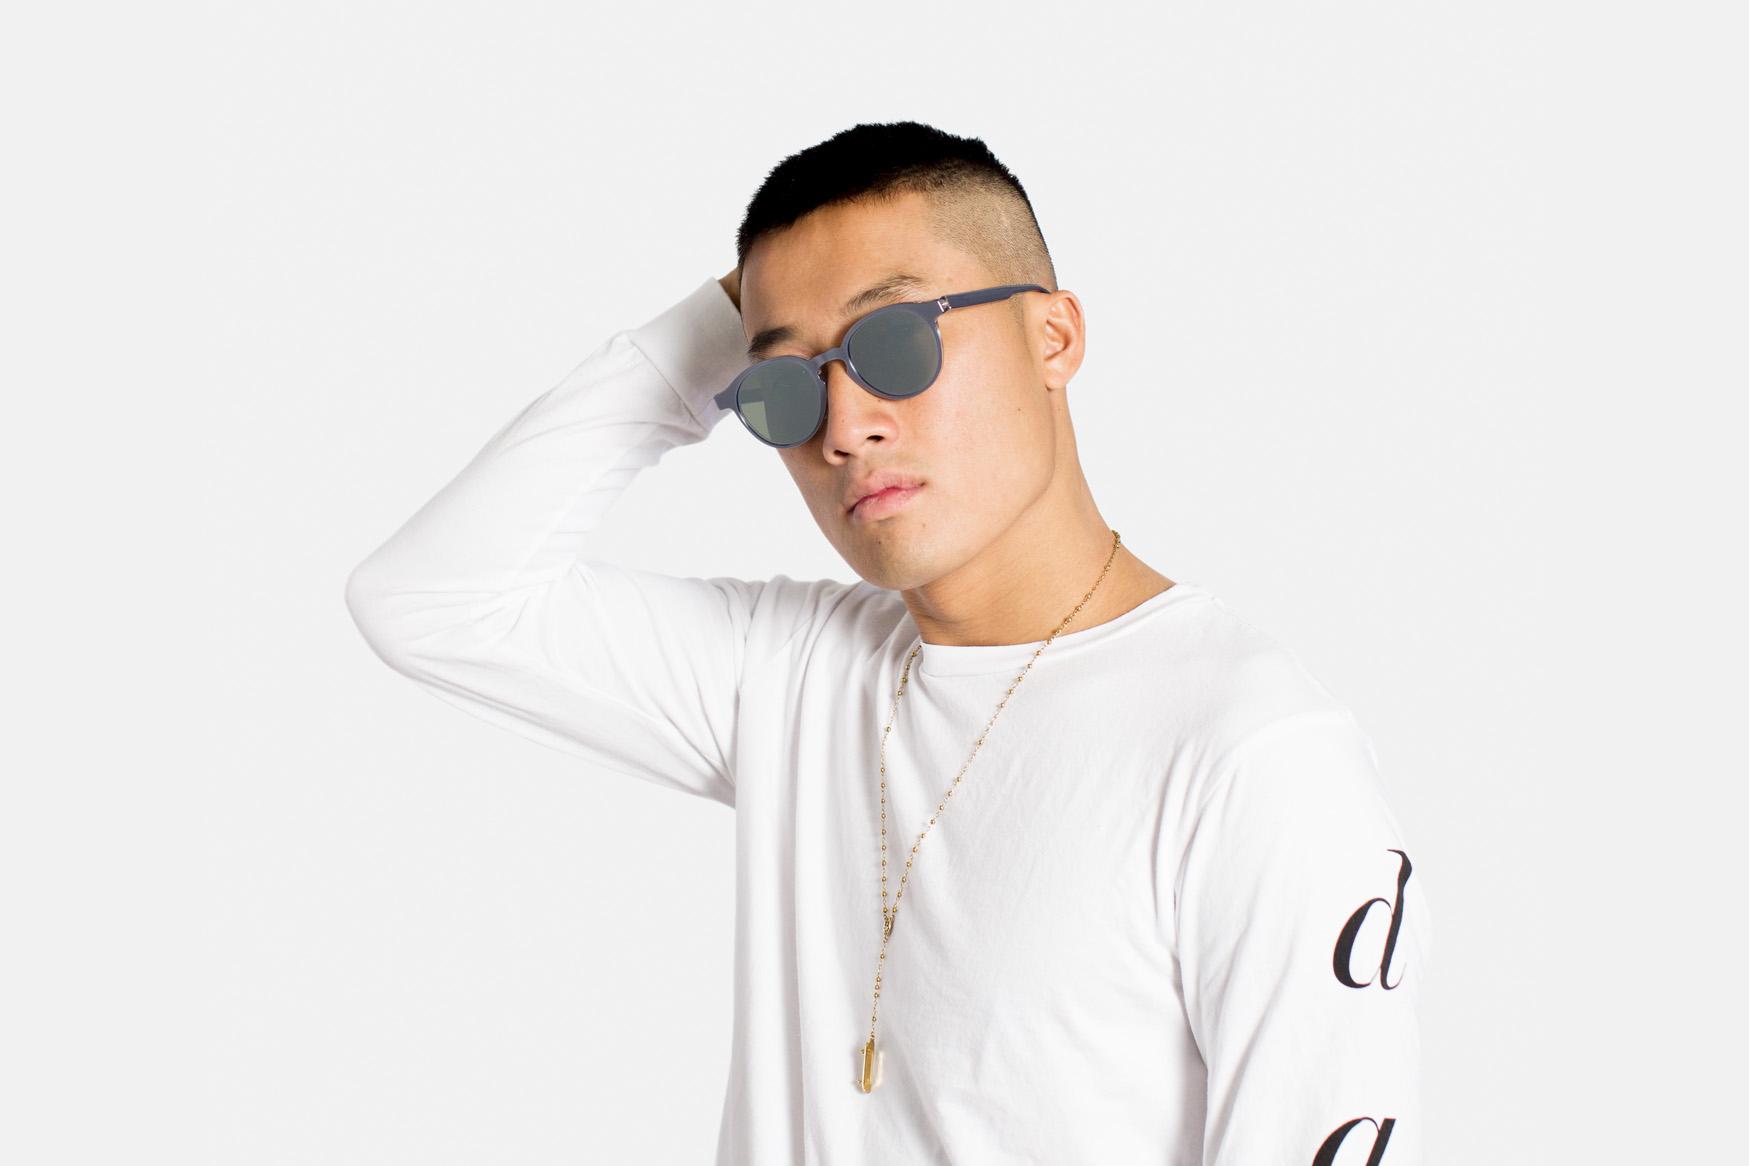 retrosuperfuture-andy-warhol-iconic-series-ss16-eyewear-7